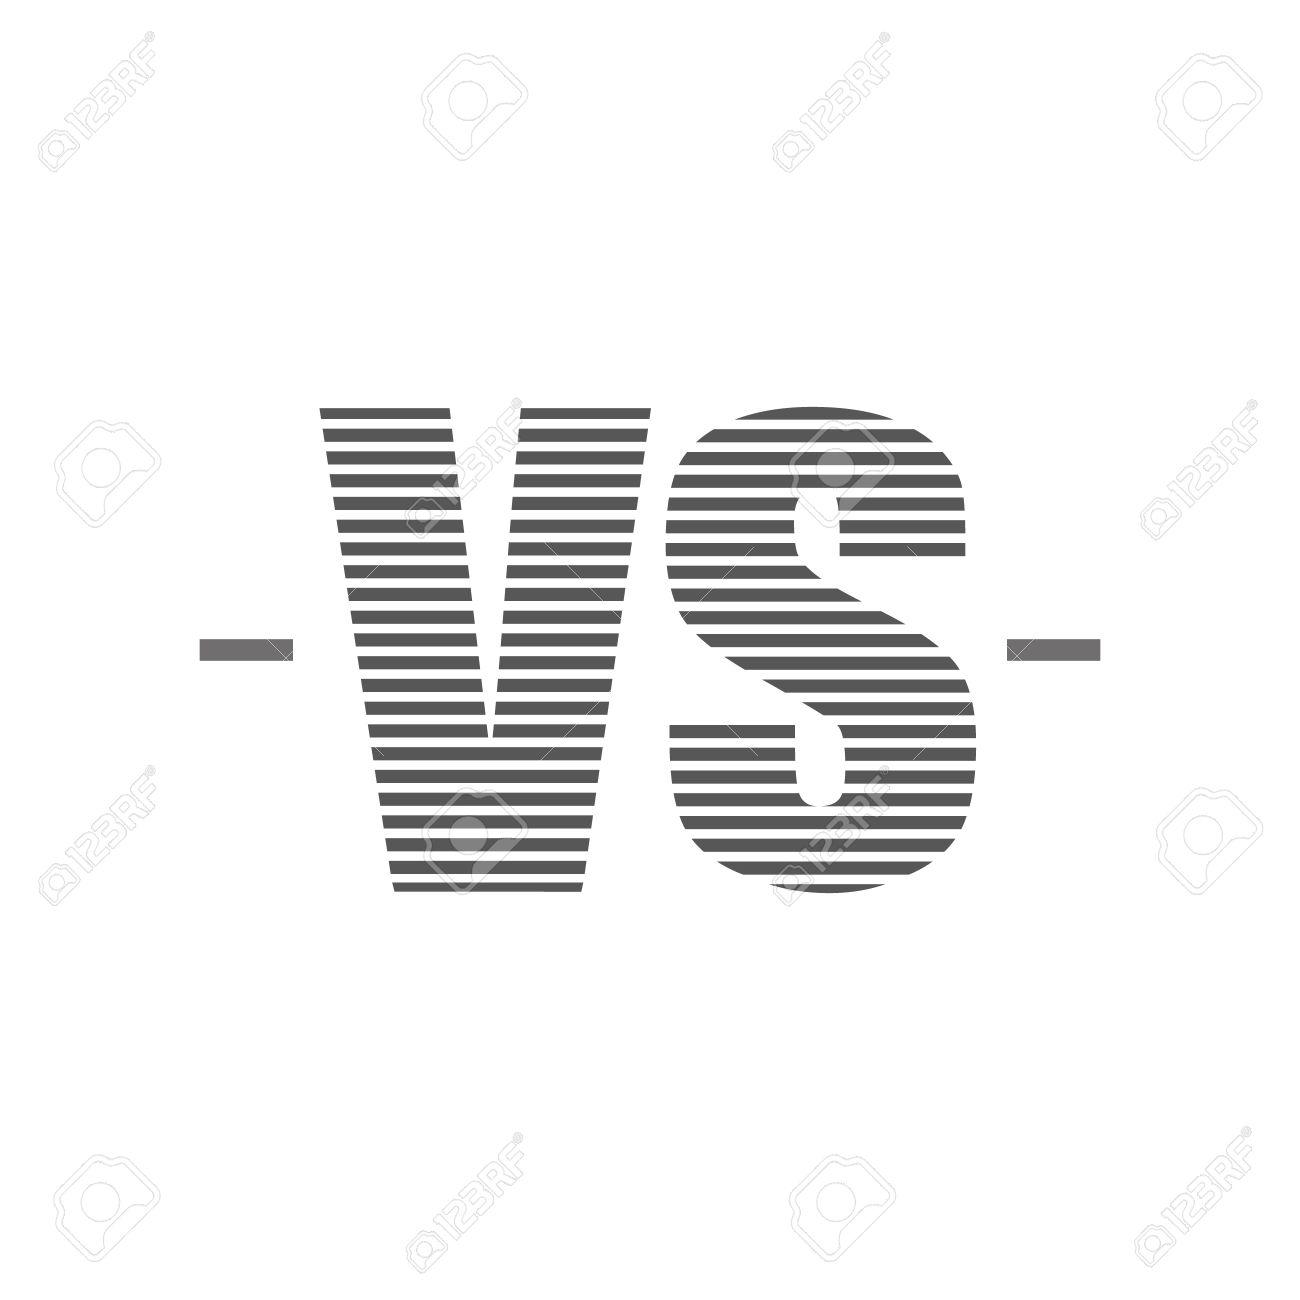 Background image vs background - Versus Logo Vs Vector Letters Illustration Isolated On White Background Stock Vector 49362330